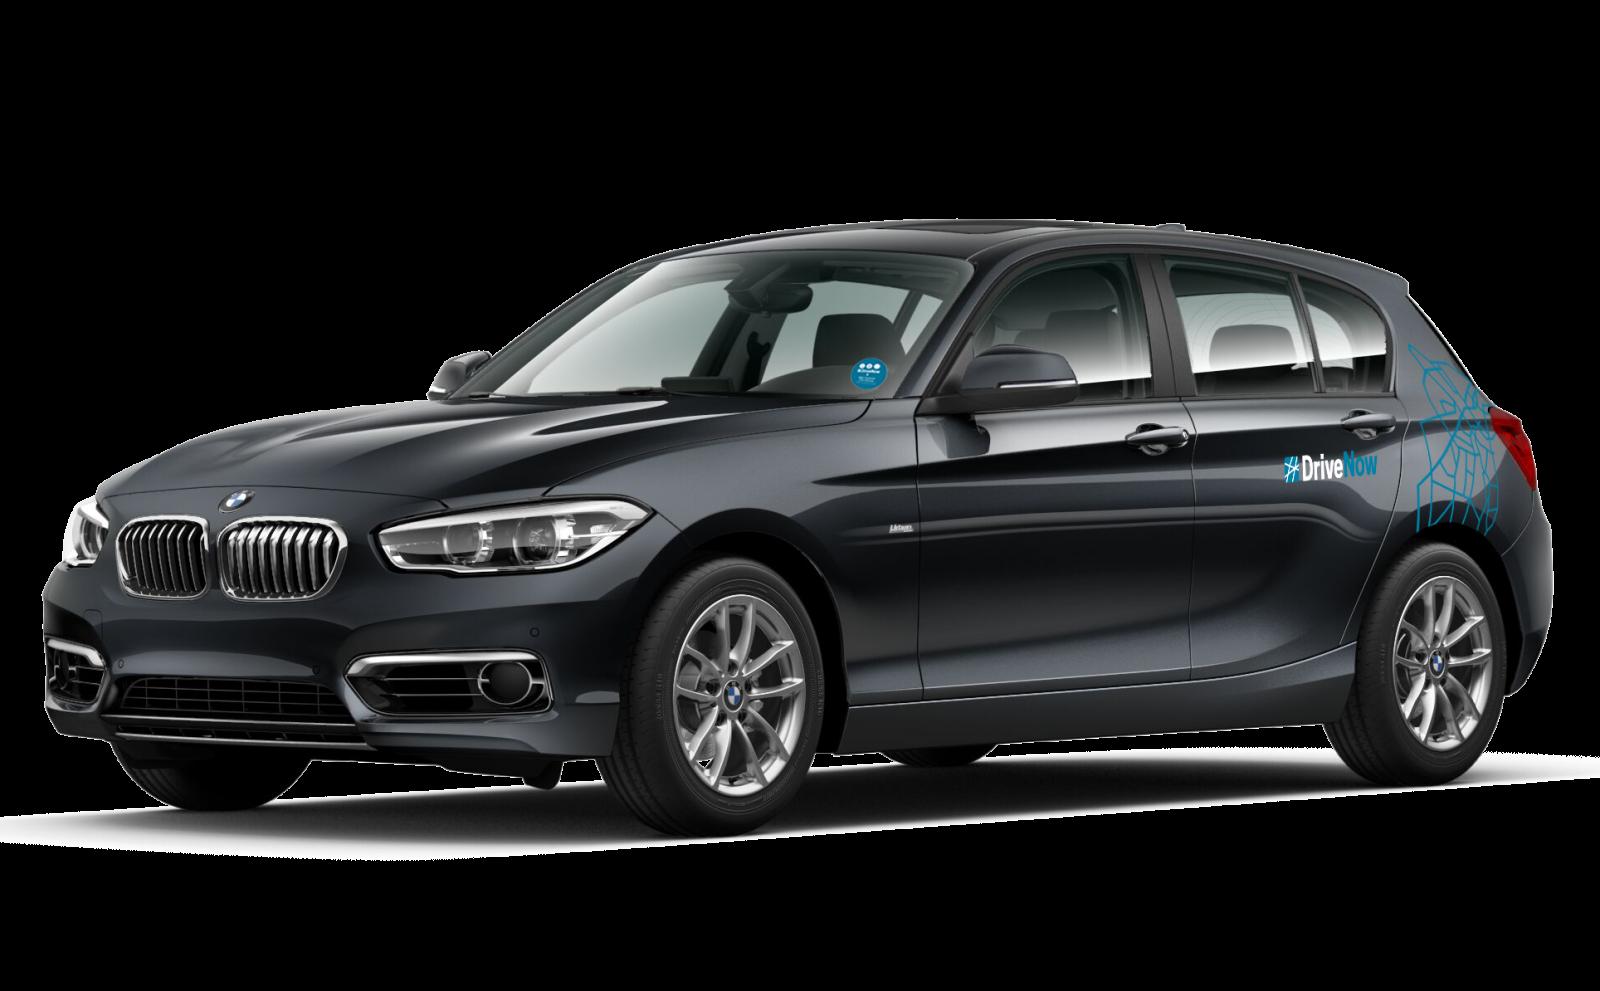 DriveNow_BMW_1SeriesLCI_Silhouette_Transvers_MineralGrey (2)_10